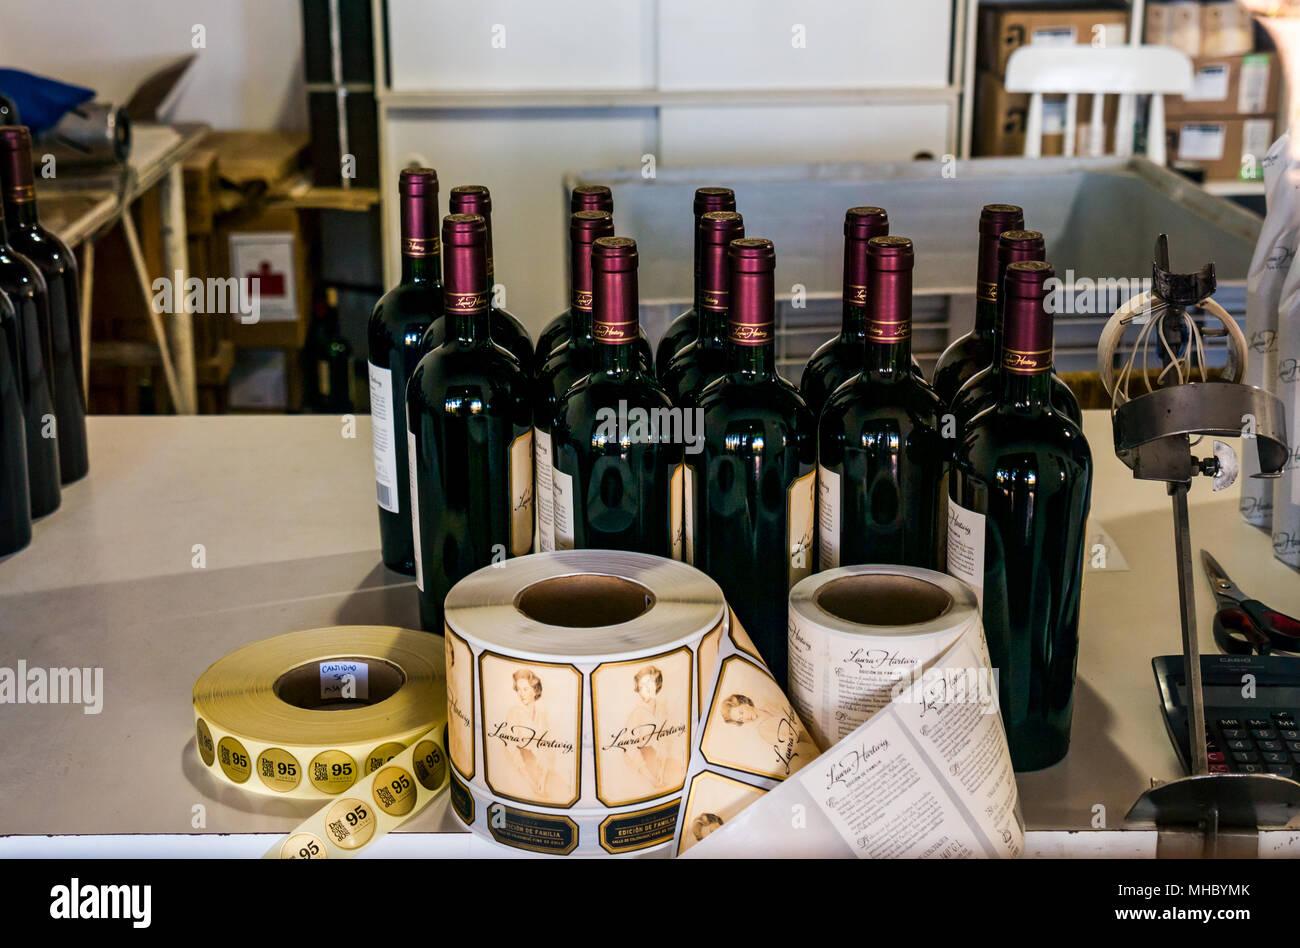 Wine bottle labelling at Laura Hartwig winery, Santa Cruz wine region, Colchagua Valley, Chile, South America - Stock Image